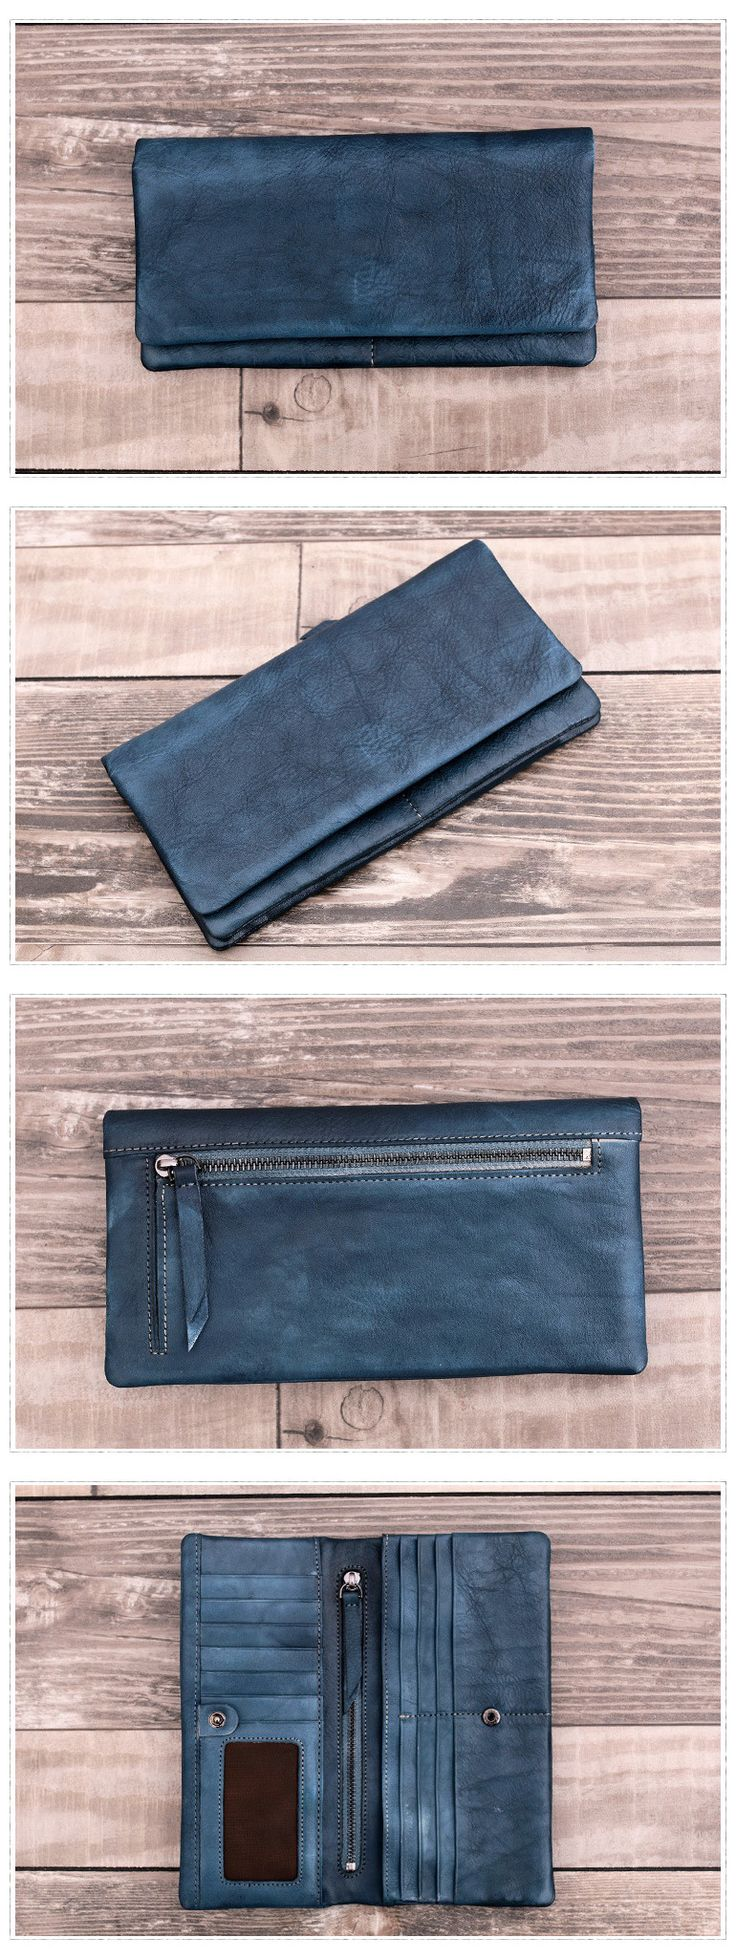 Vintage Style Genuine Natural Leather Wallet Long Wallet Men's Wallet Dimensions: Length: 19.5 cm; Height: 10 cm Color: Blue/Black/Grey